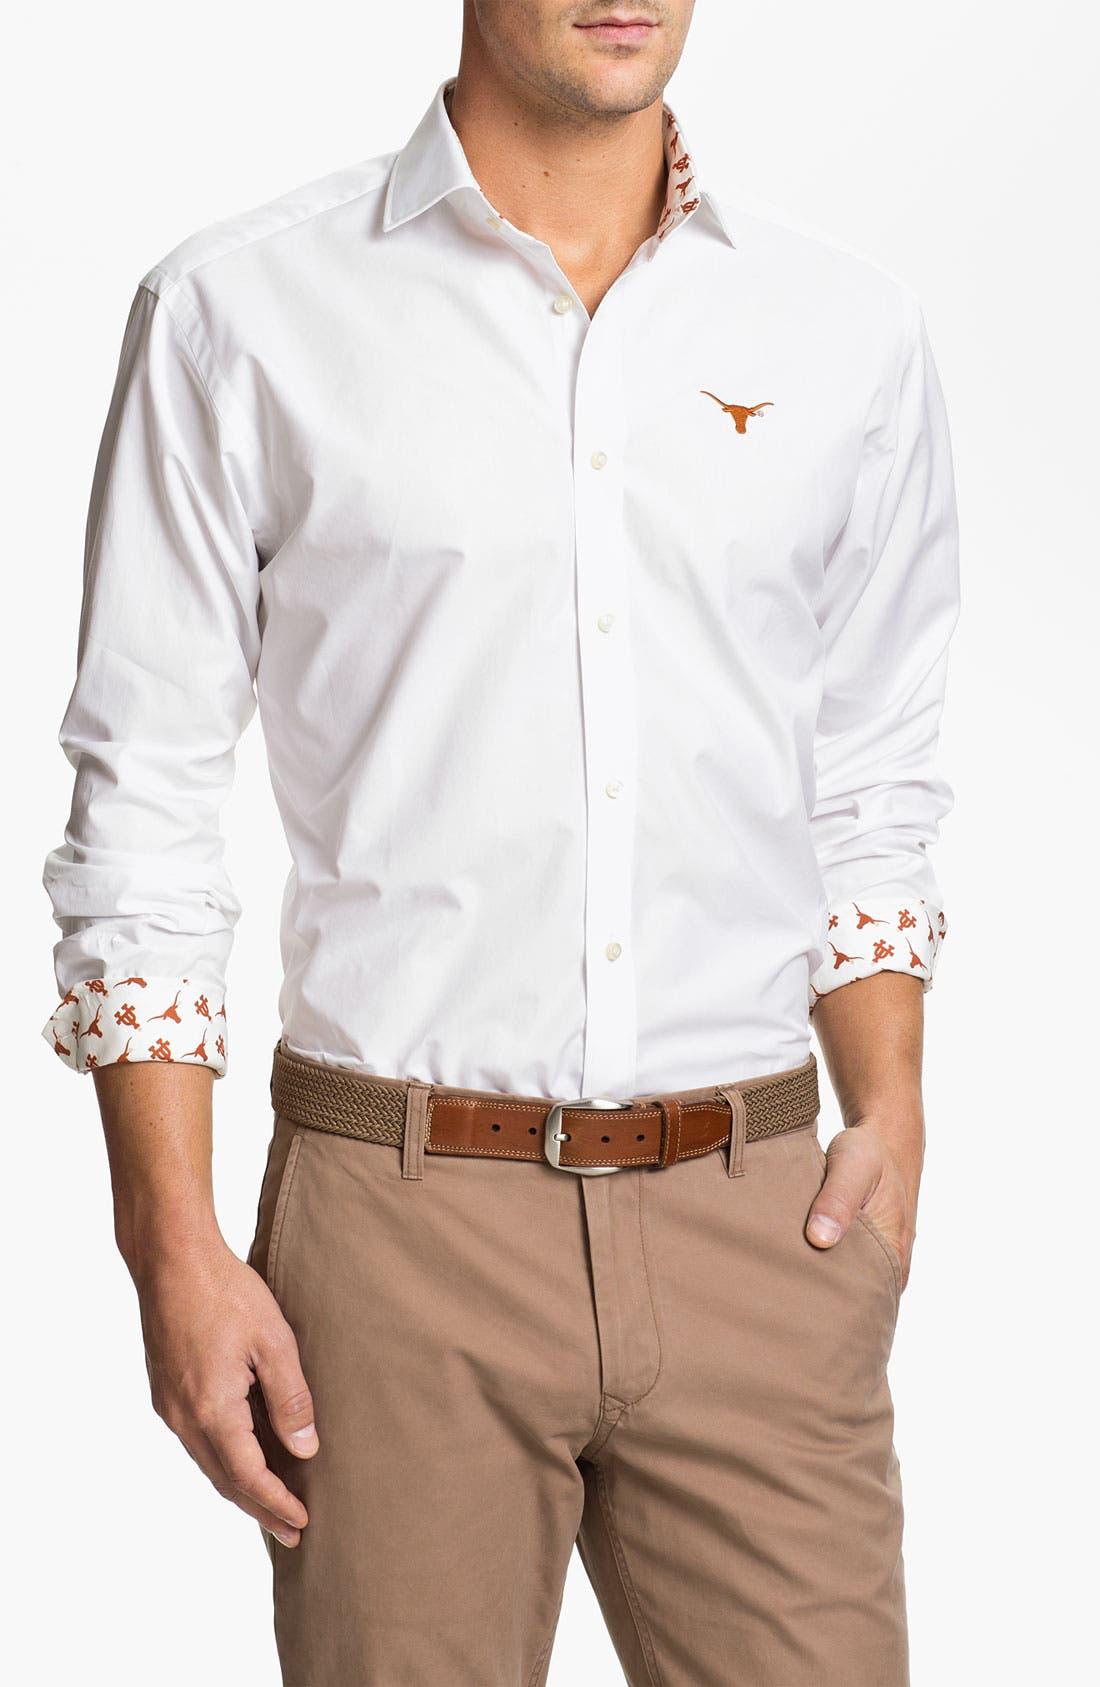 Alternate Image 1 Selected - Thomas Dean 'University of Texas' Sport Shirt